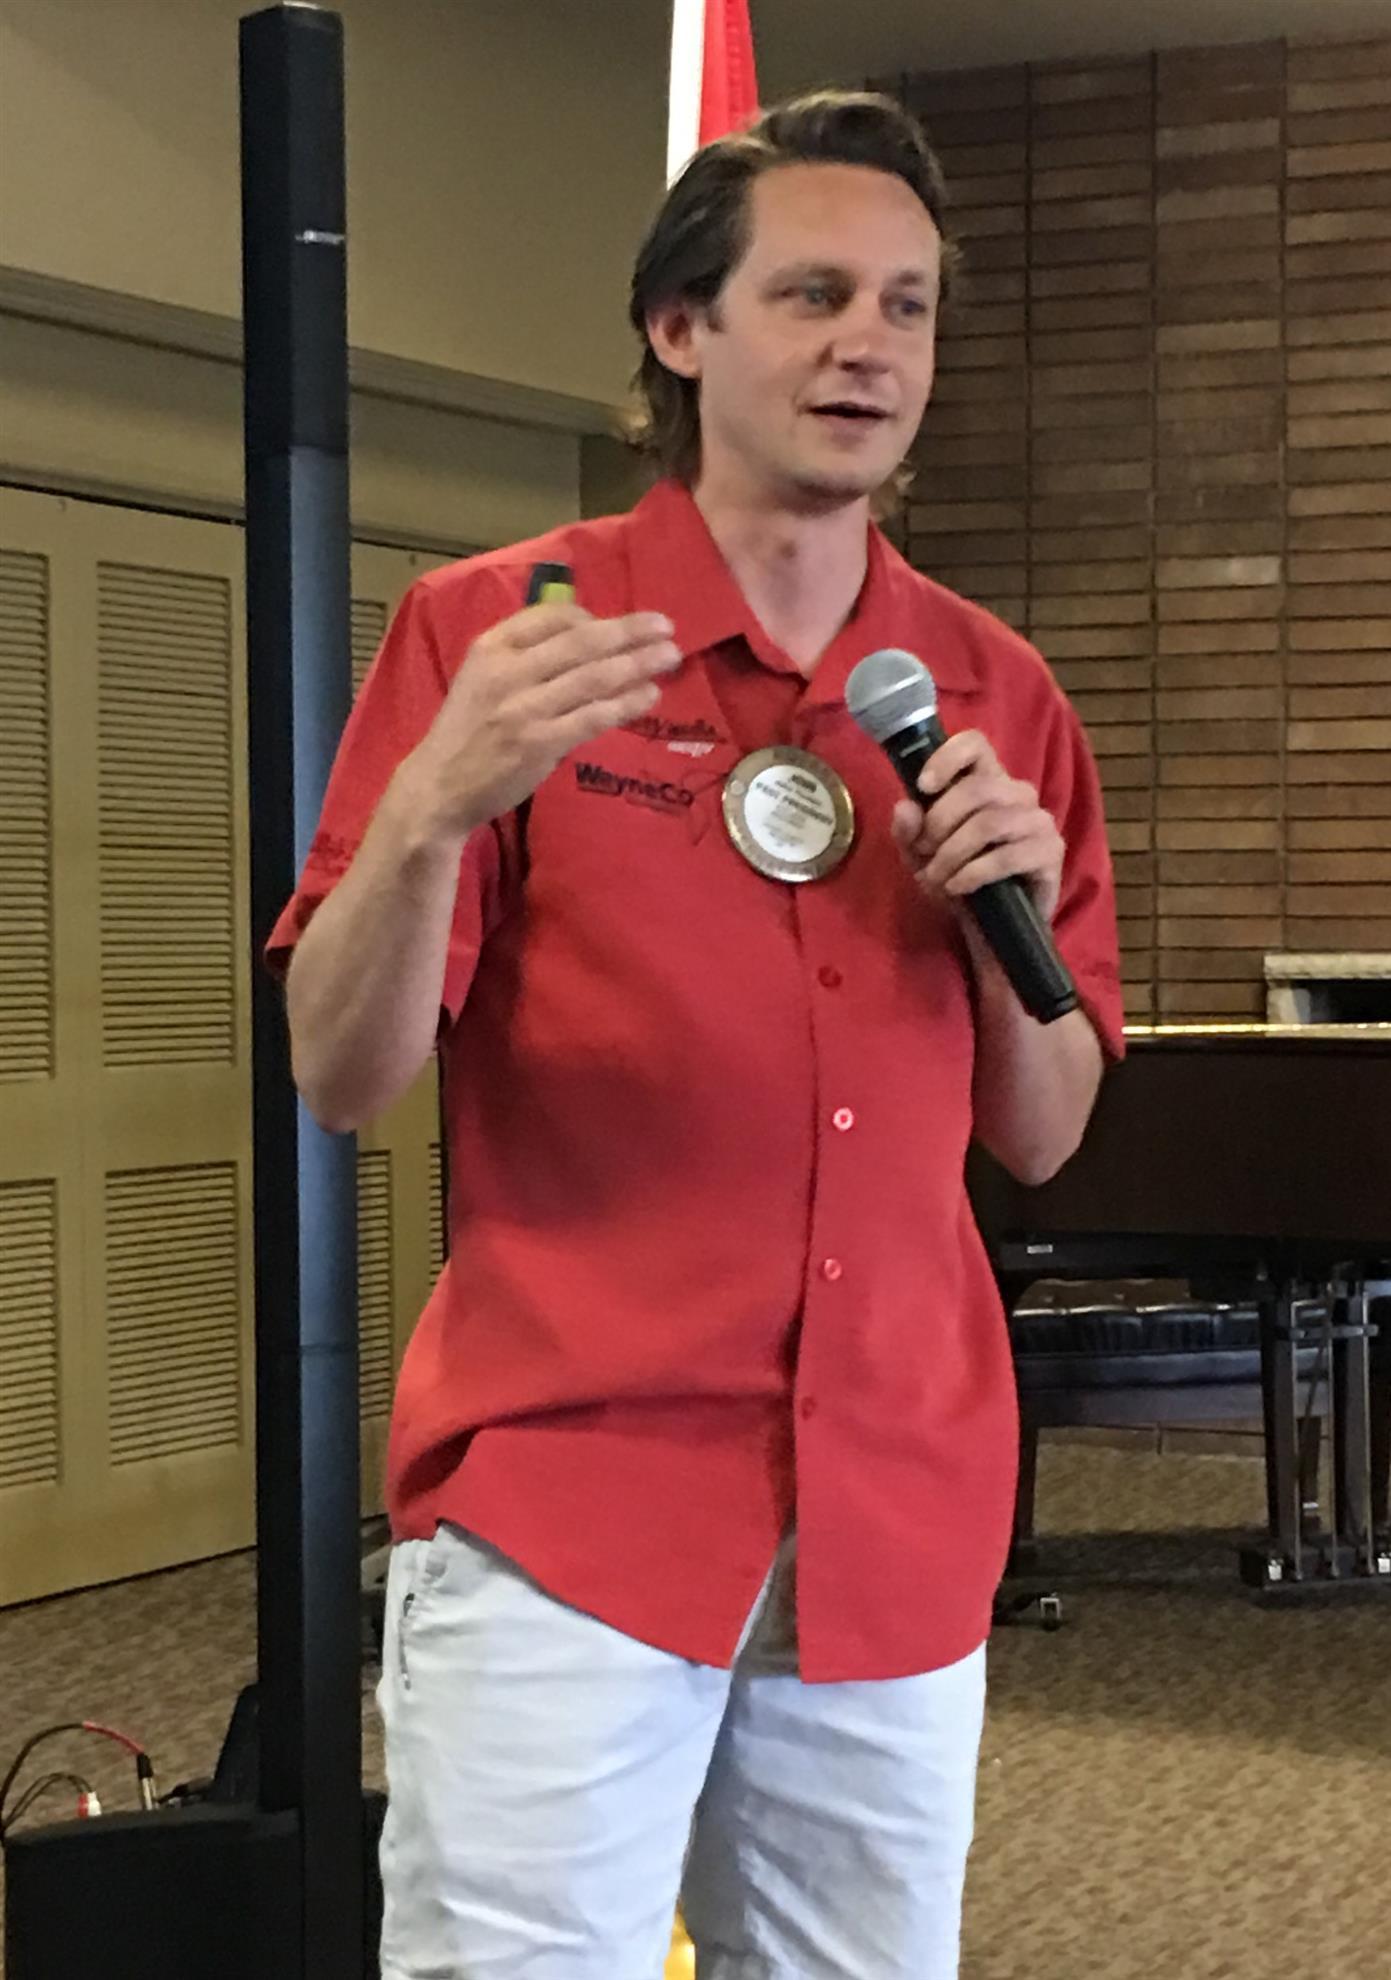 b4433f477 Stories | Rotary Club of Arlington